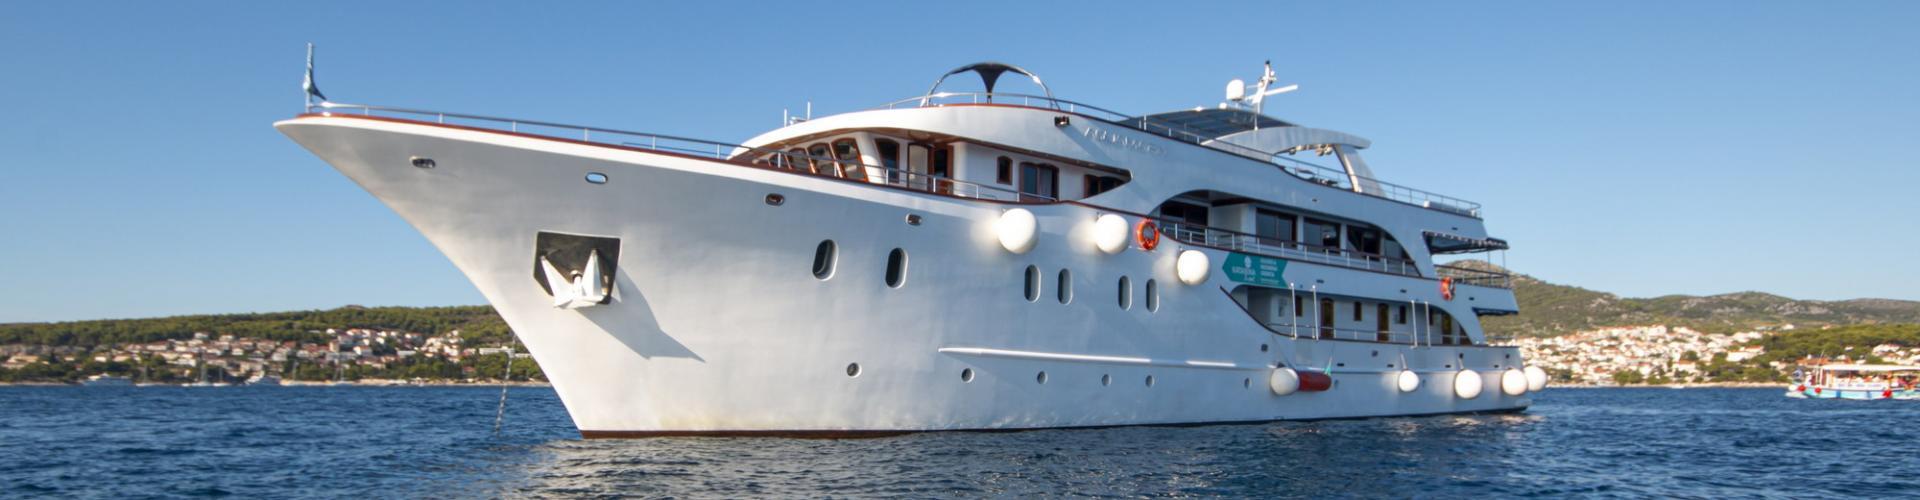 motor boat Deluxe cruiser MV Aquamarin